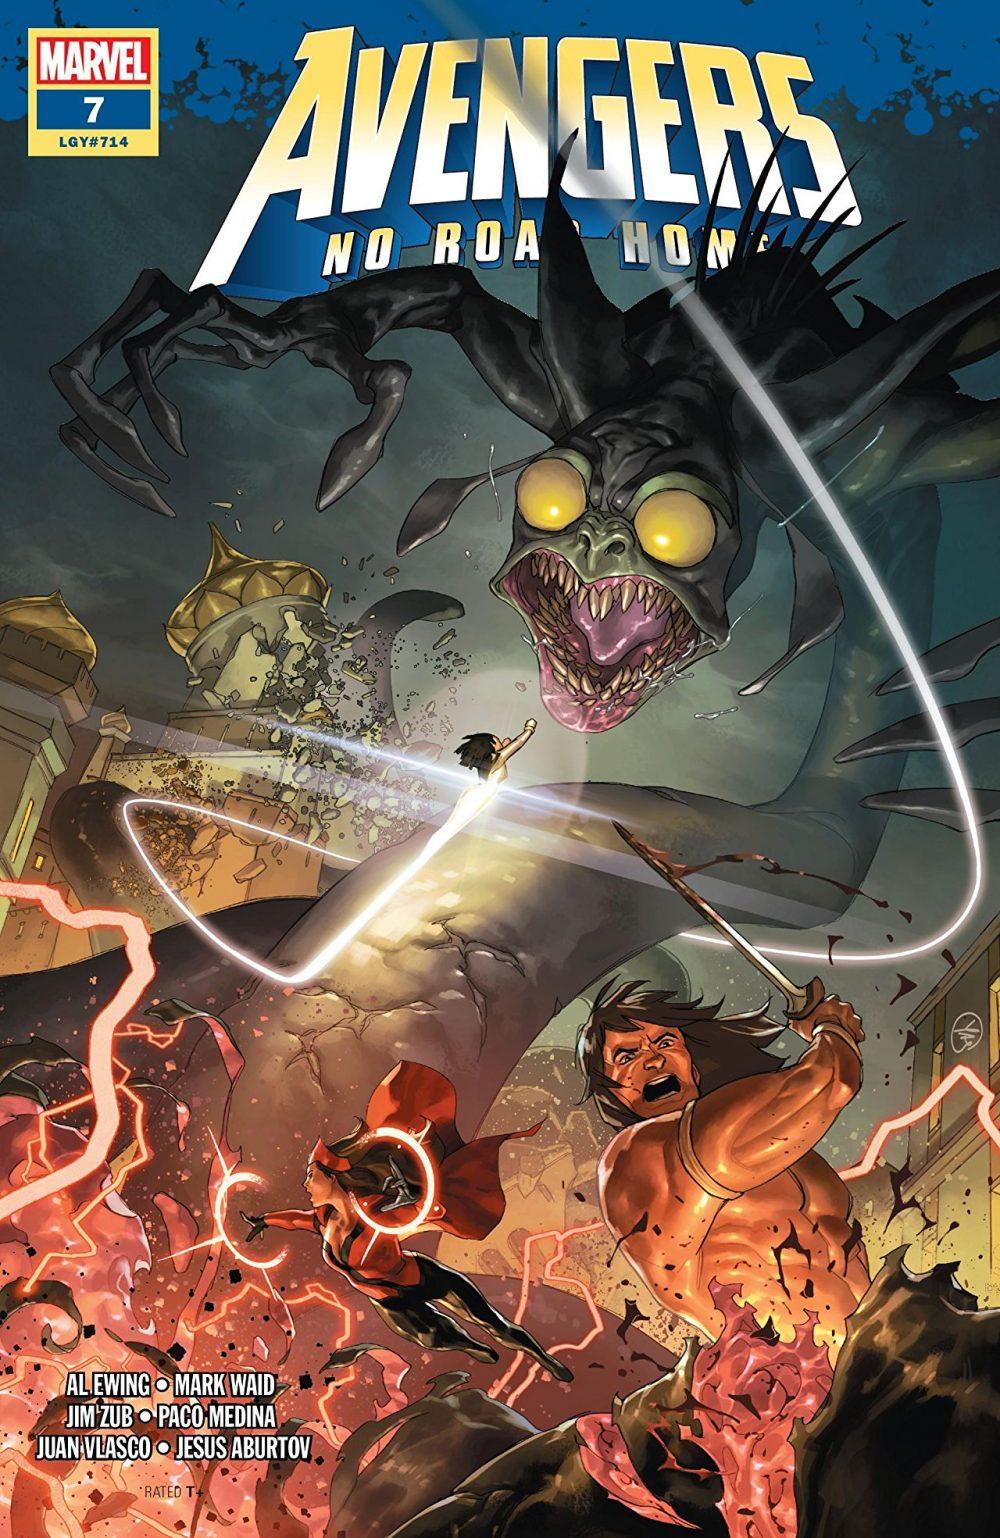 Avengers: No Road Home #7, copertina di Yasmine Putri